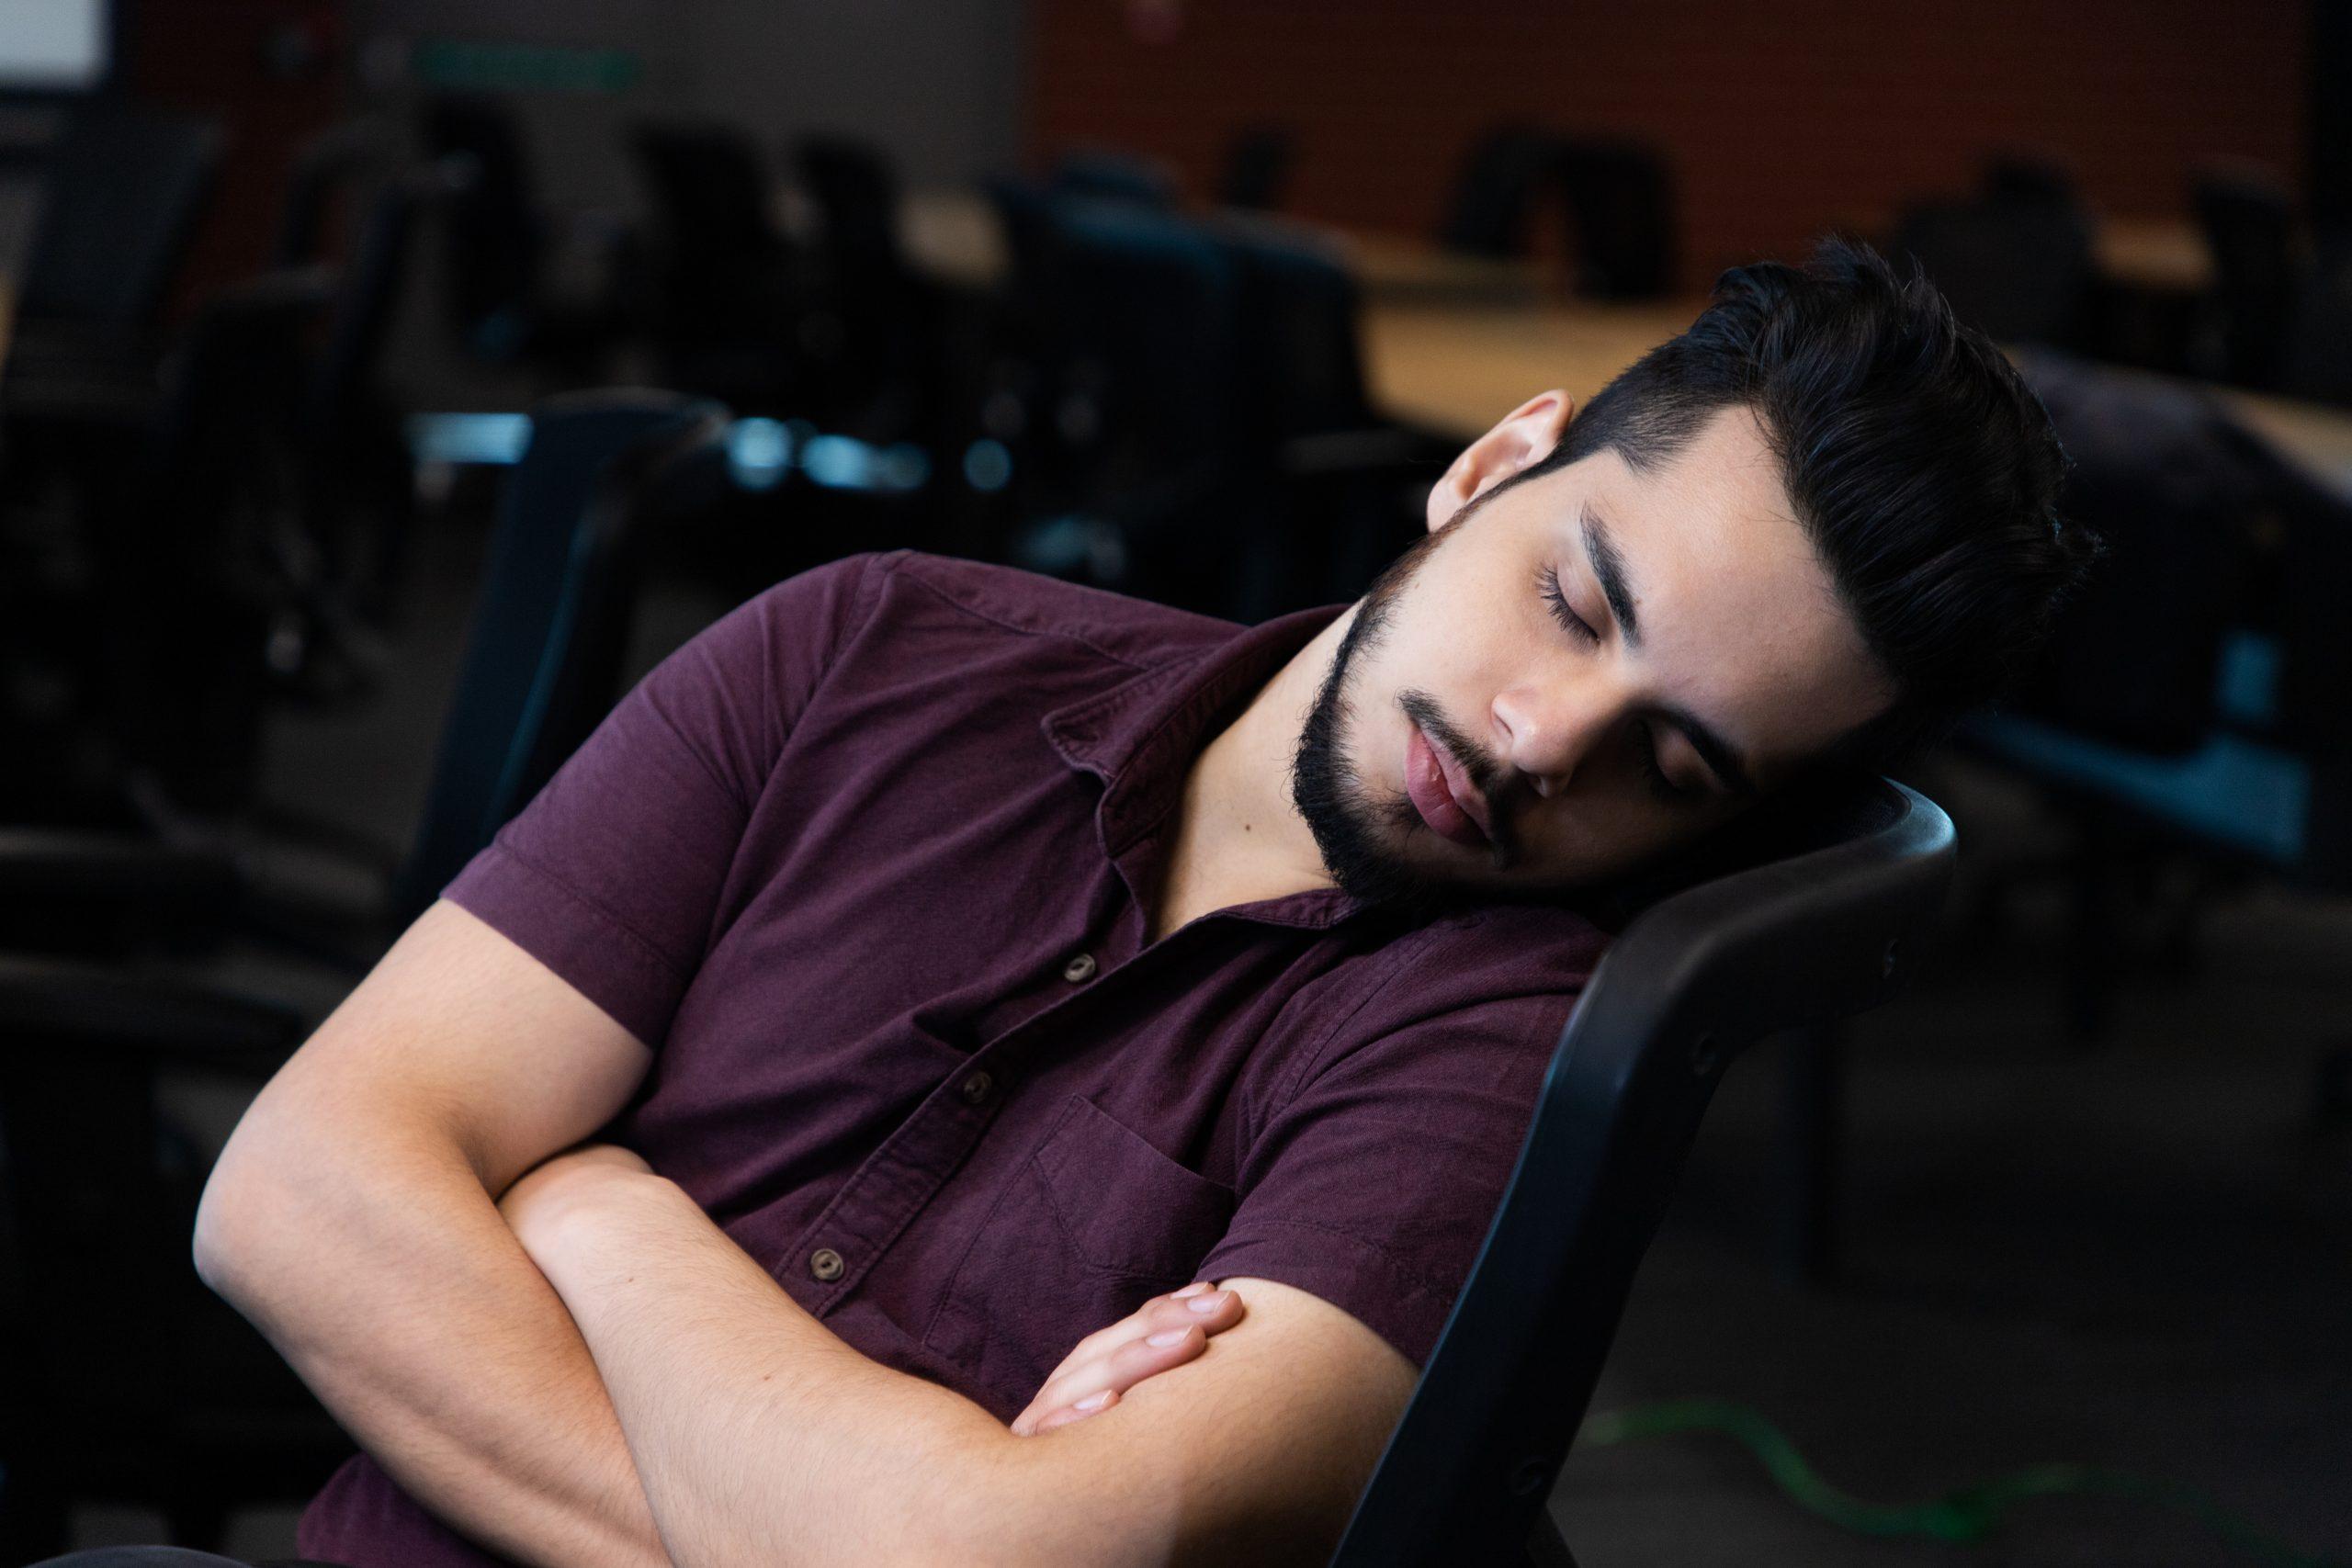 man sleeping on a chair